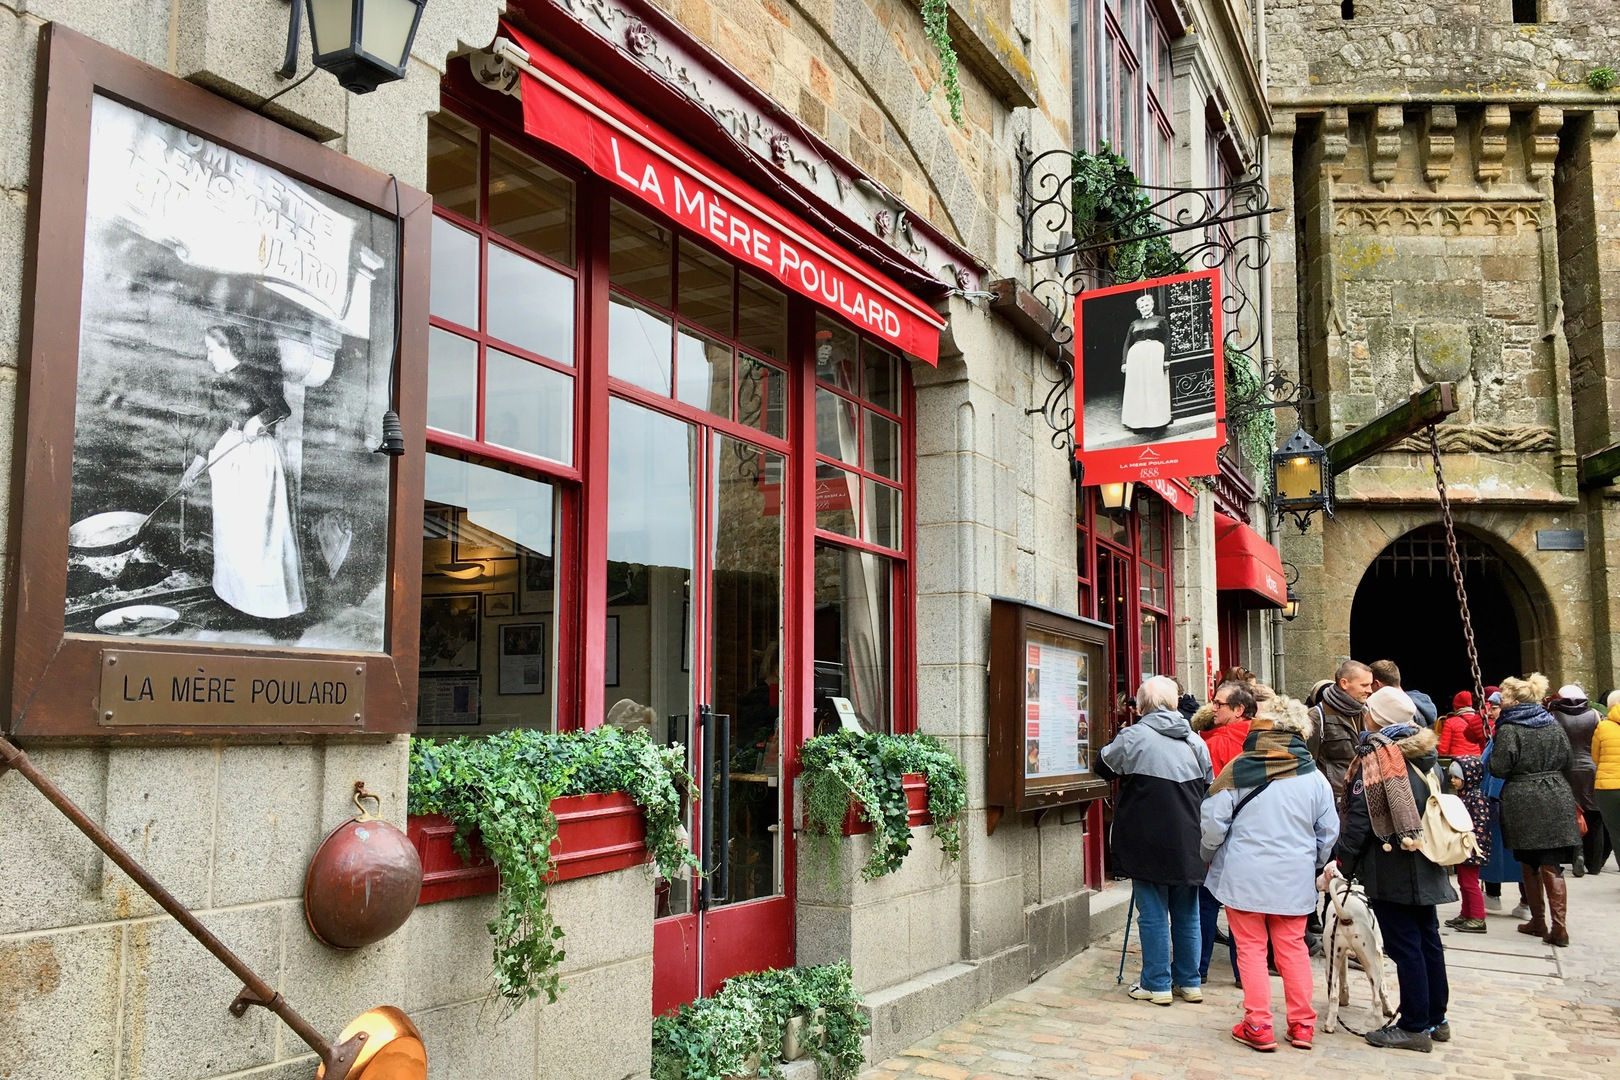 Paris: Mont Saint-Michel — Fougeres Day Trip by Minivan with Abbey Visit & Calvados/Cider Tasting